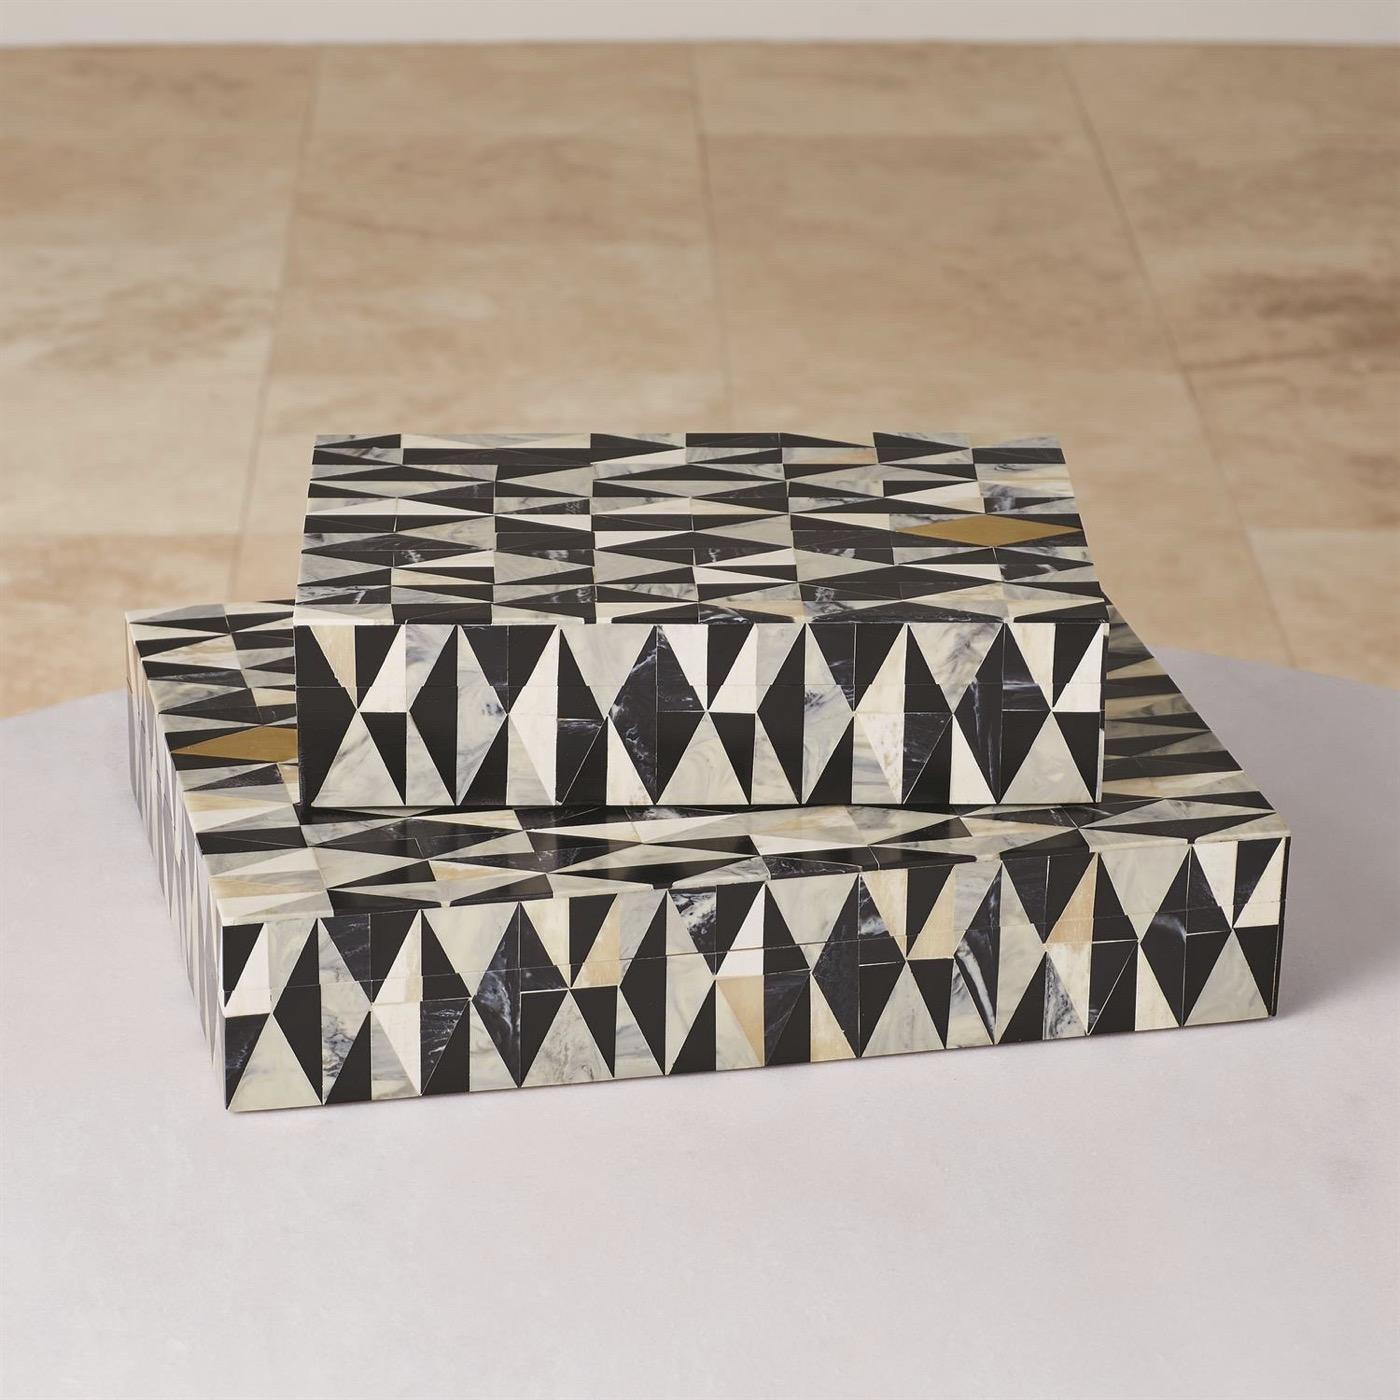 Saldo Geometric Patterned Boxes